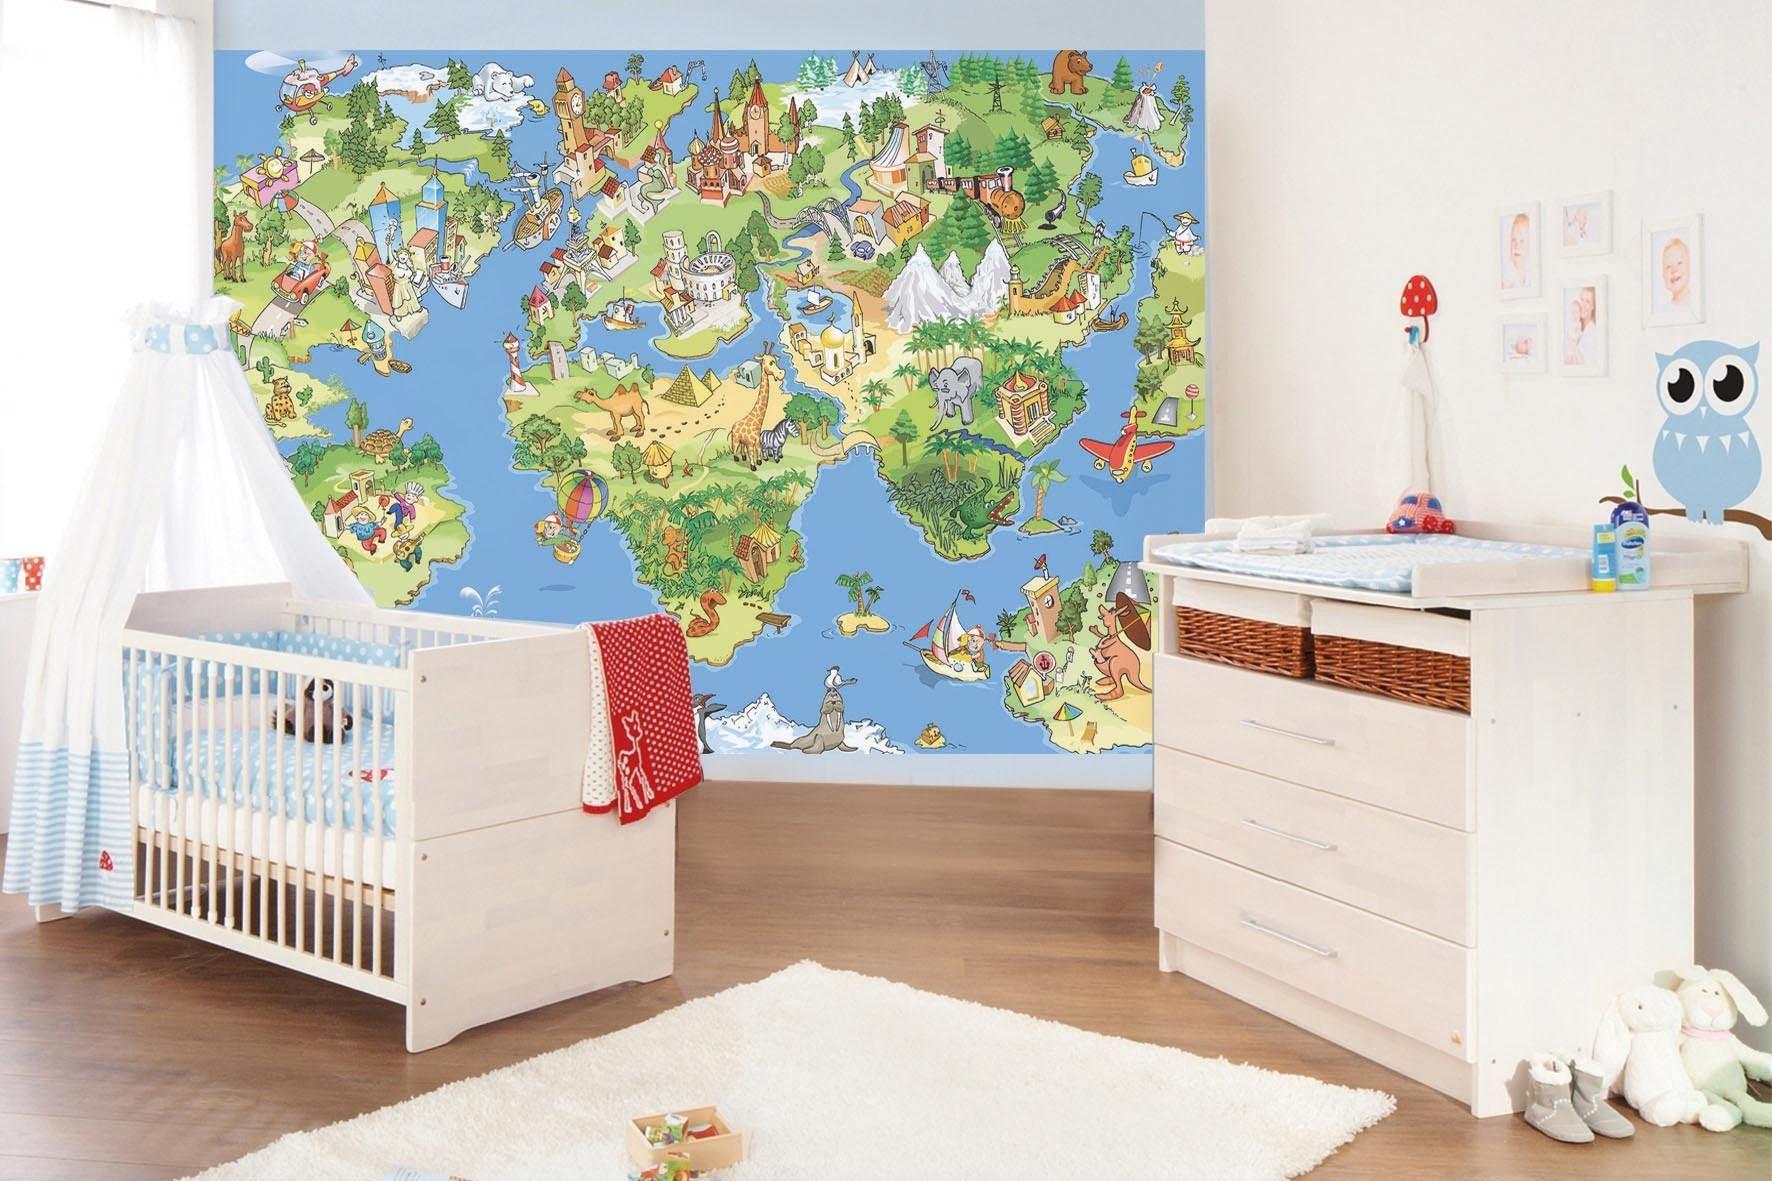 Top 6 Gender Neutral Nursery Wallpaper Themes